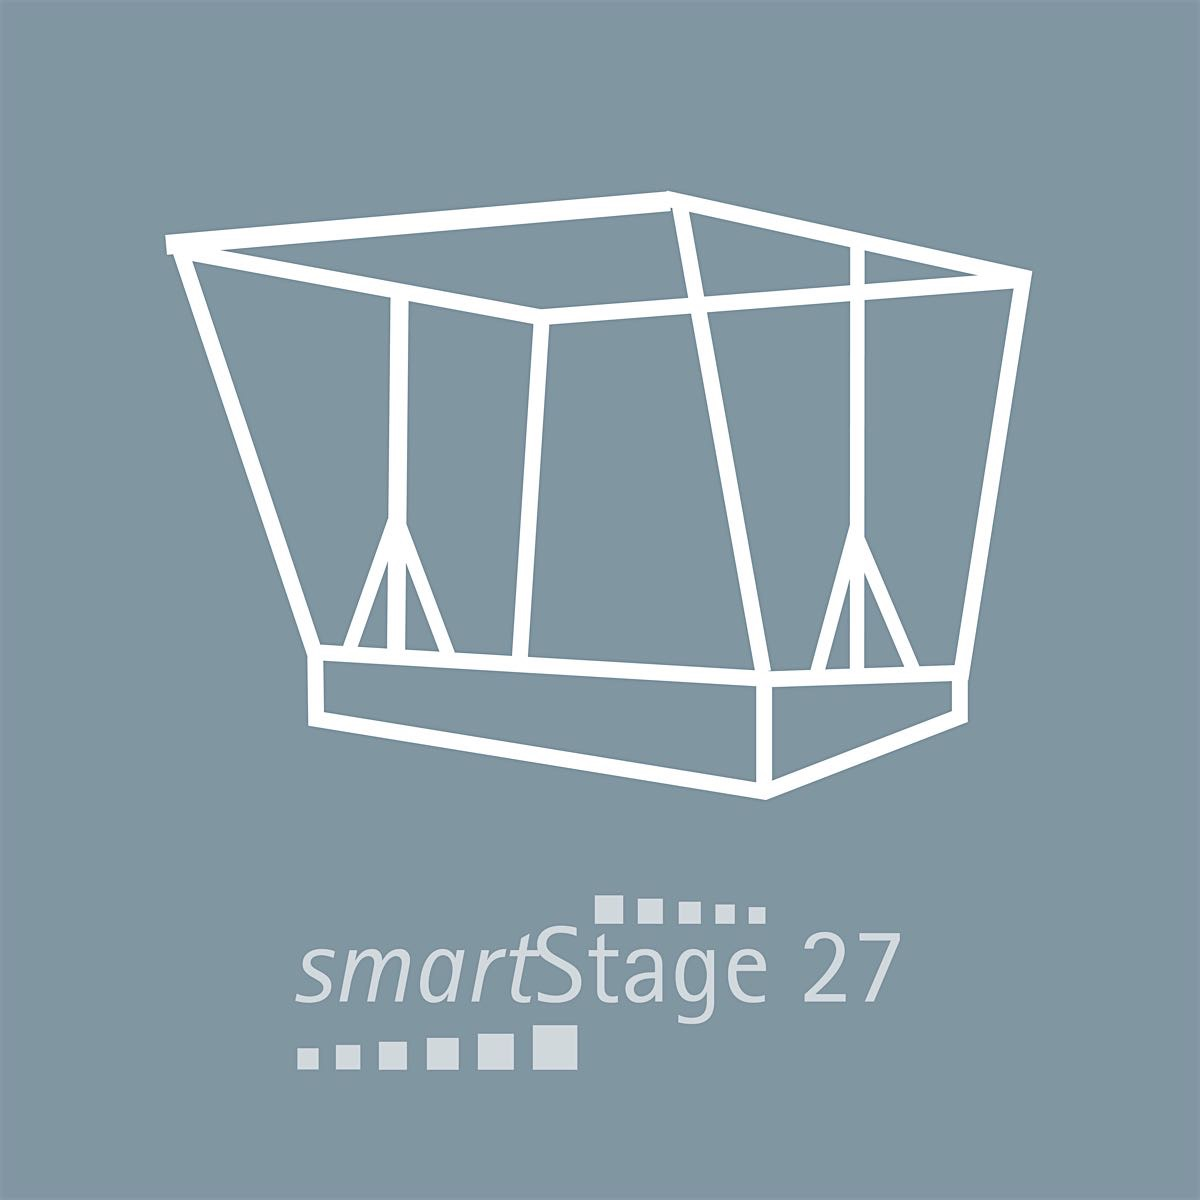 smartStage 27 - 27 qm area5.95 m Width4.55 m Depth4.70 m Height